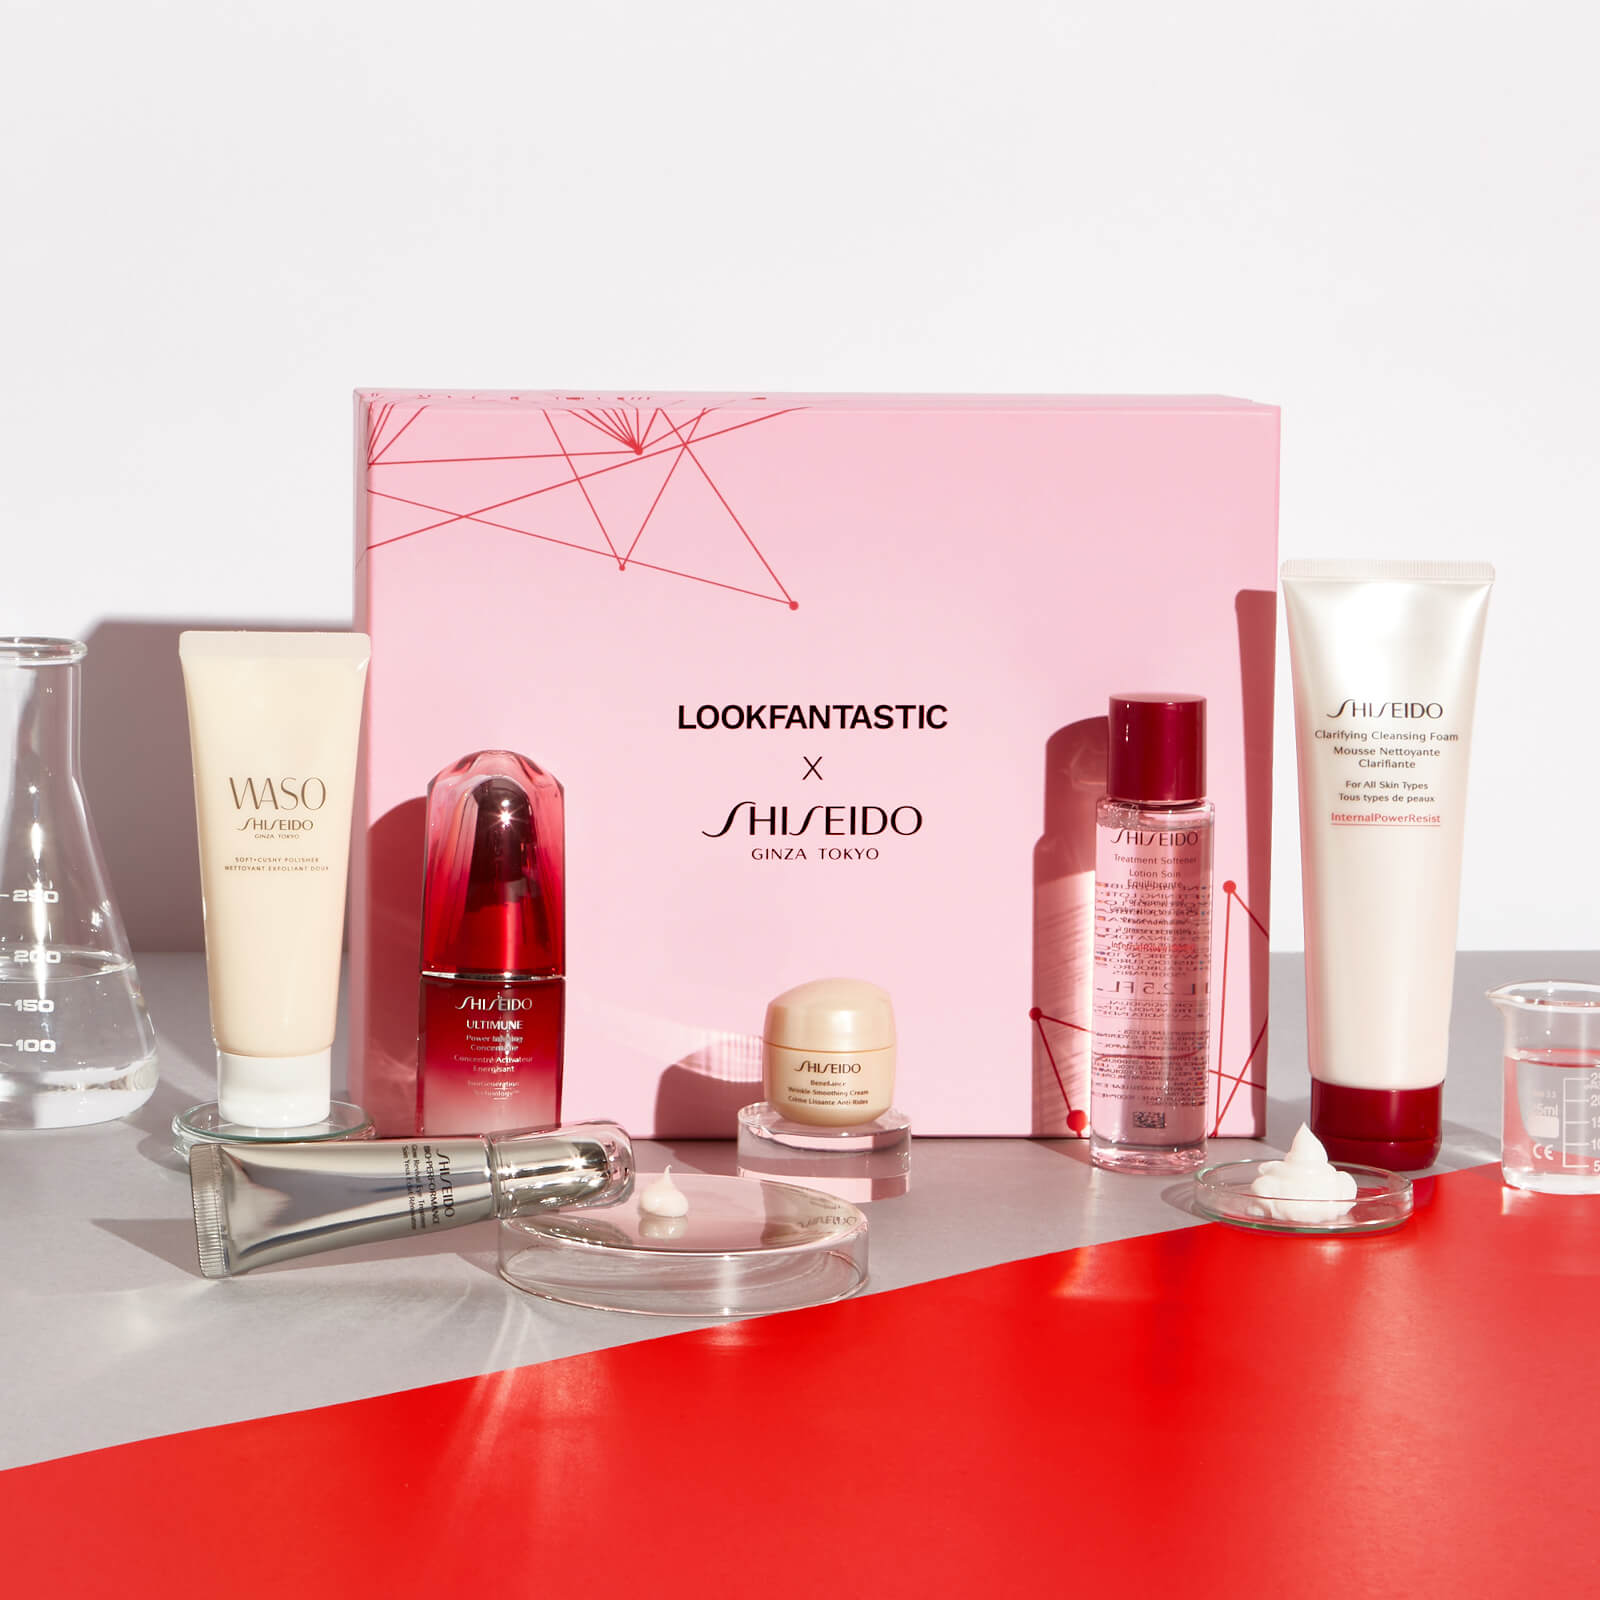 LOOKFANTASTIC X Shiseido Limited Edition